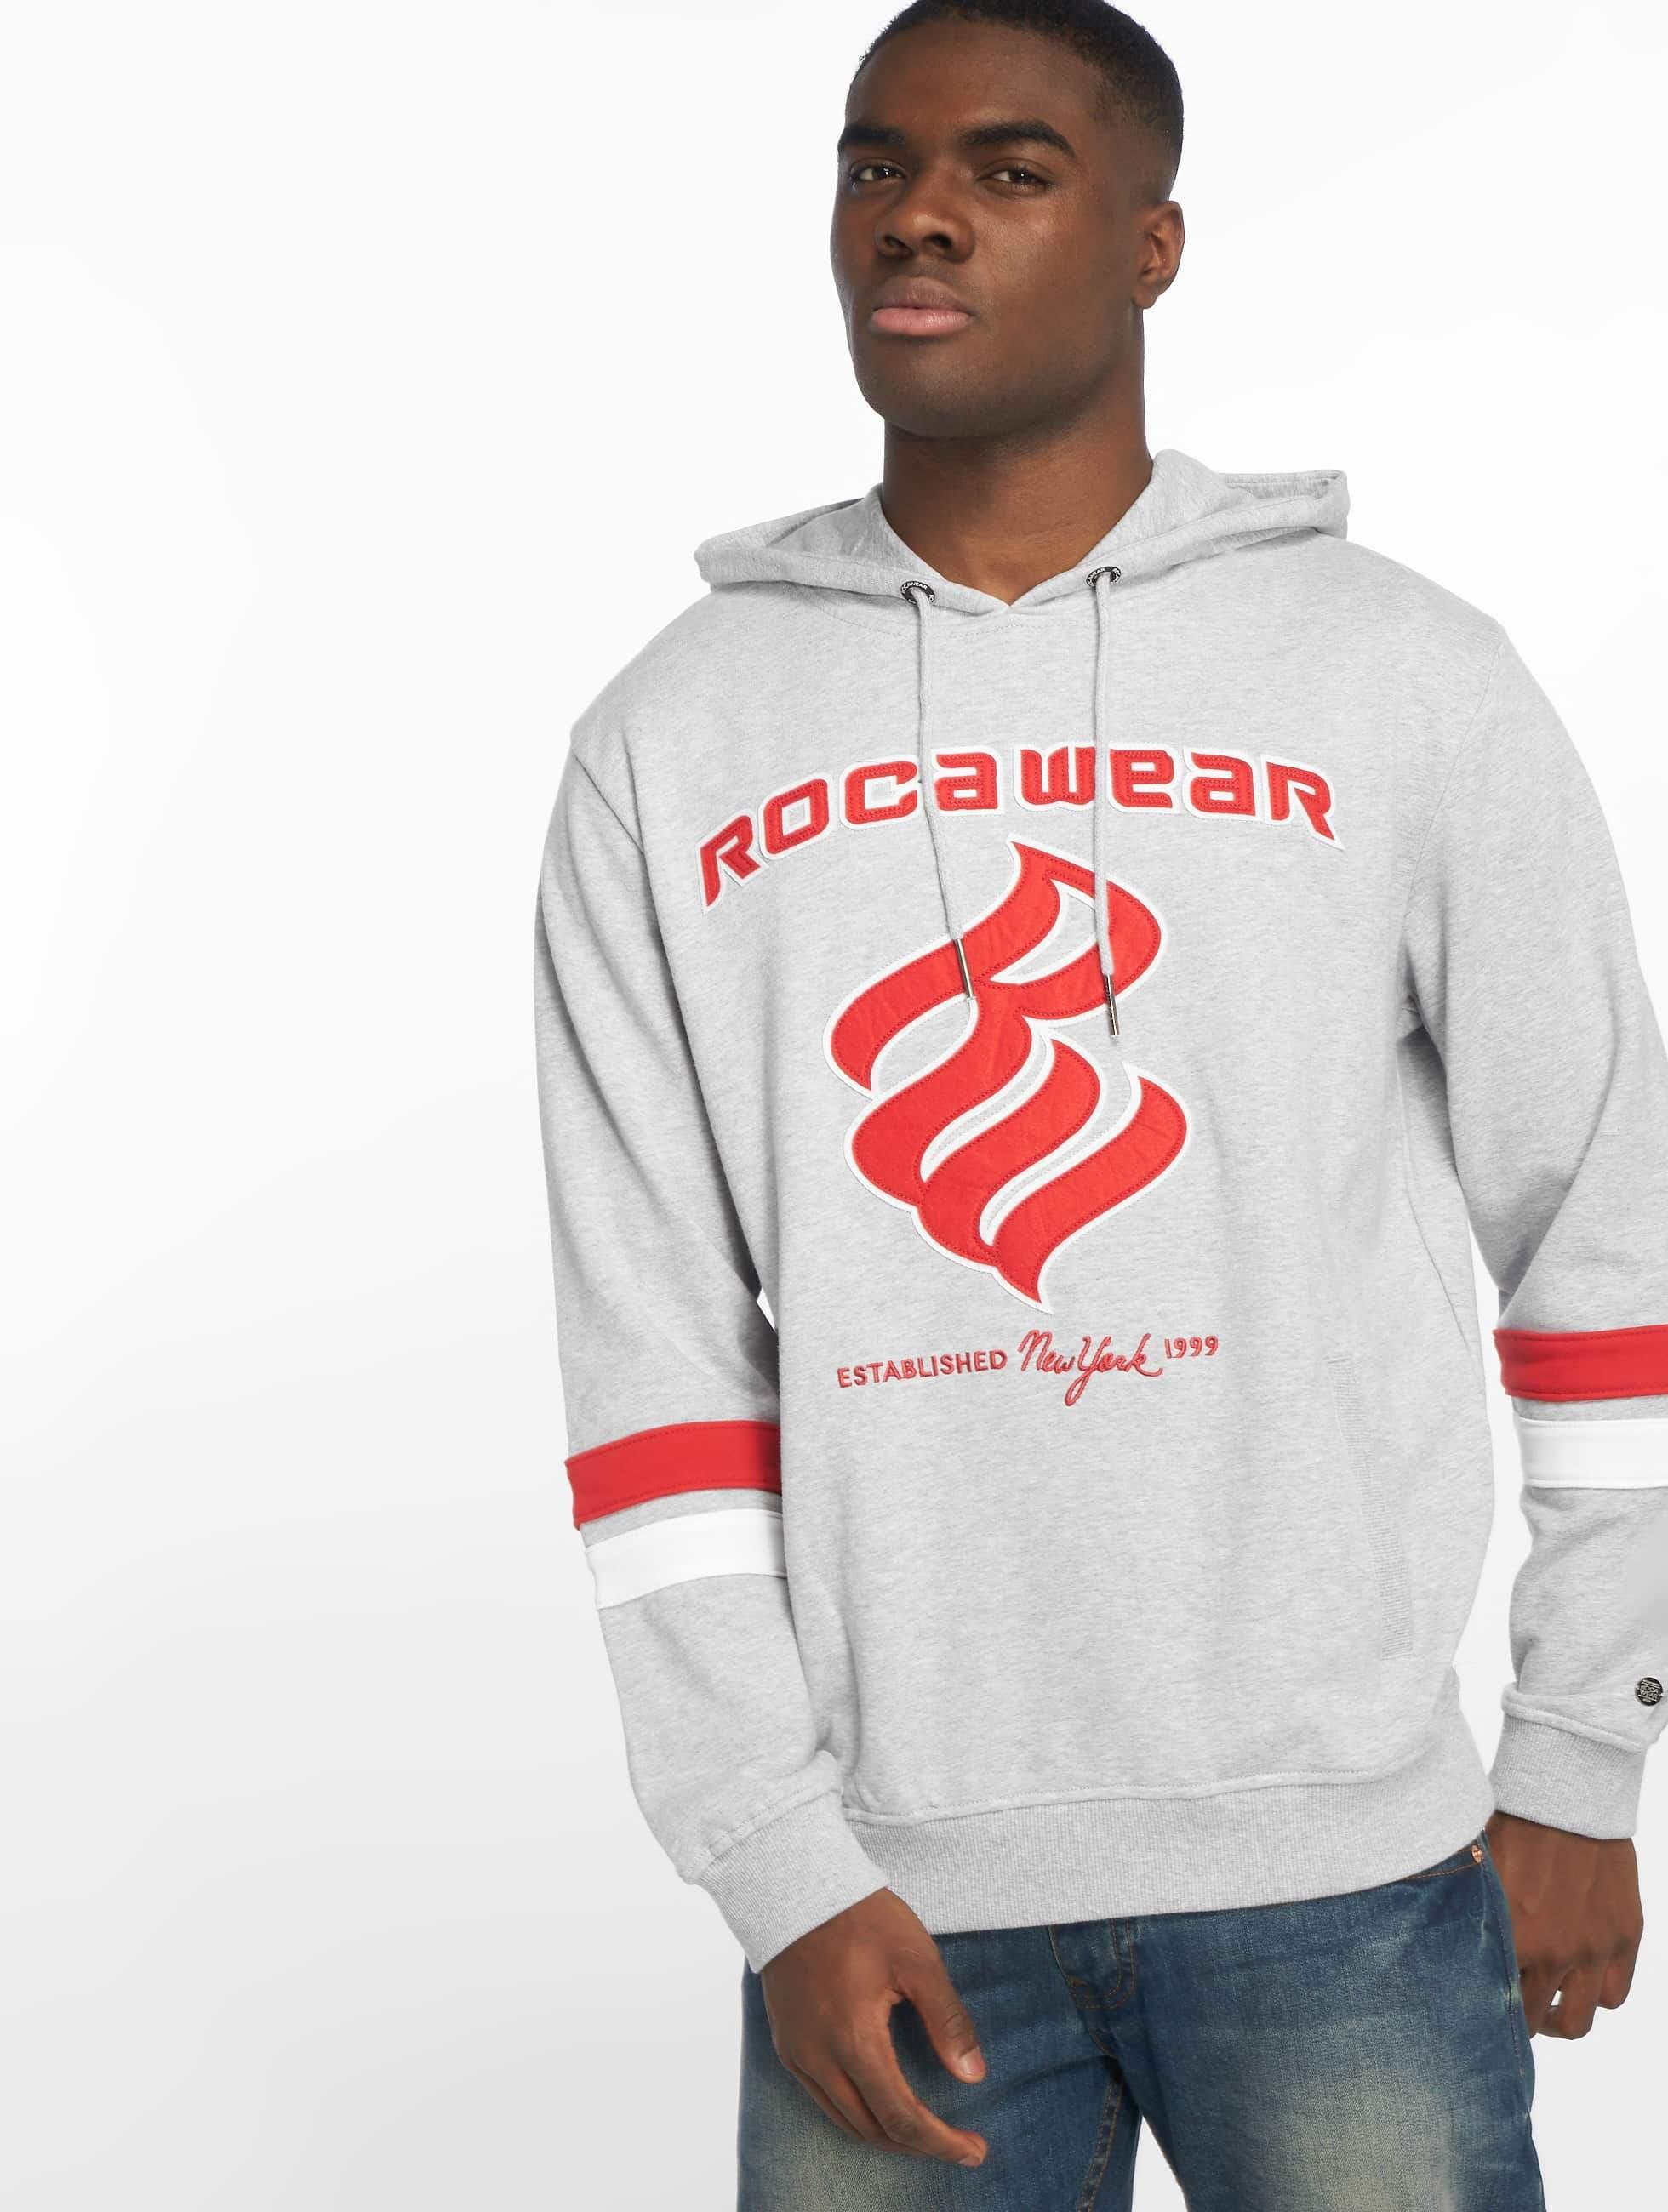 Rocawear / Hoodie DC in grey XL